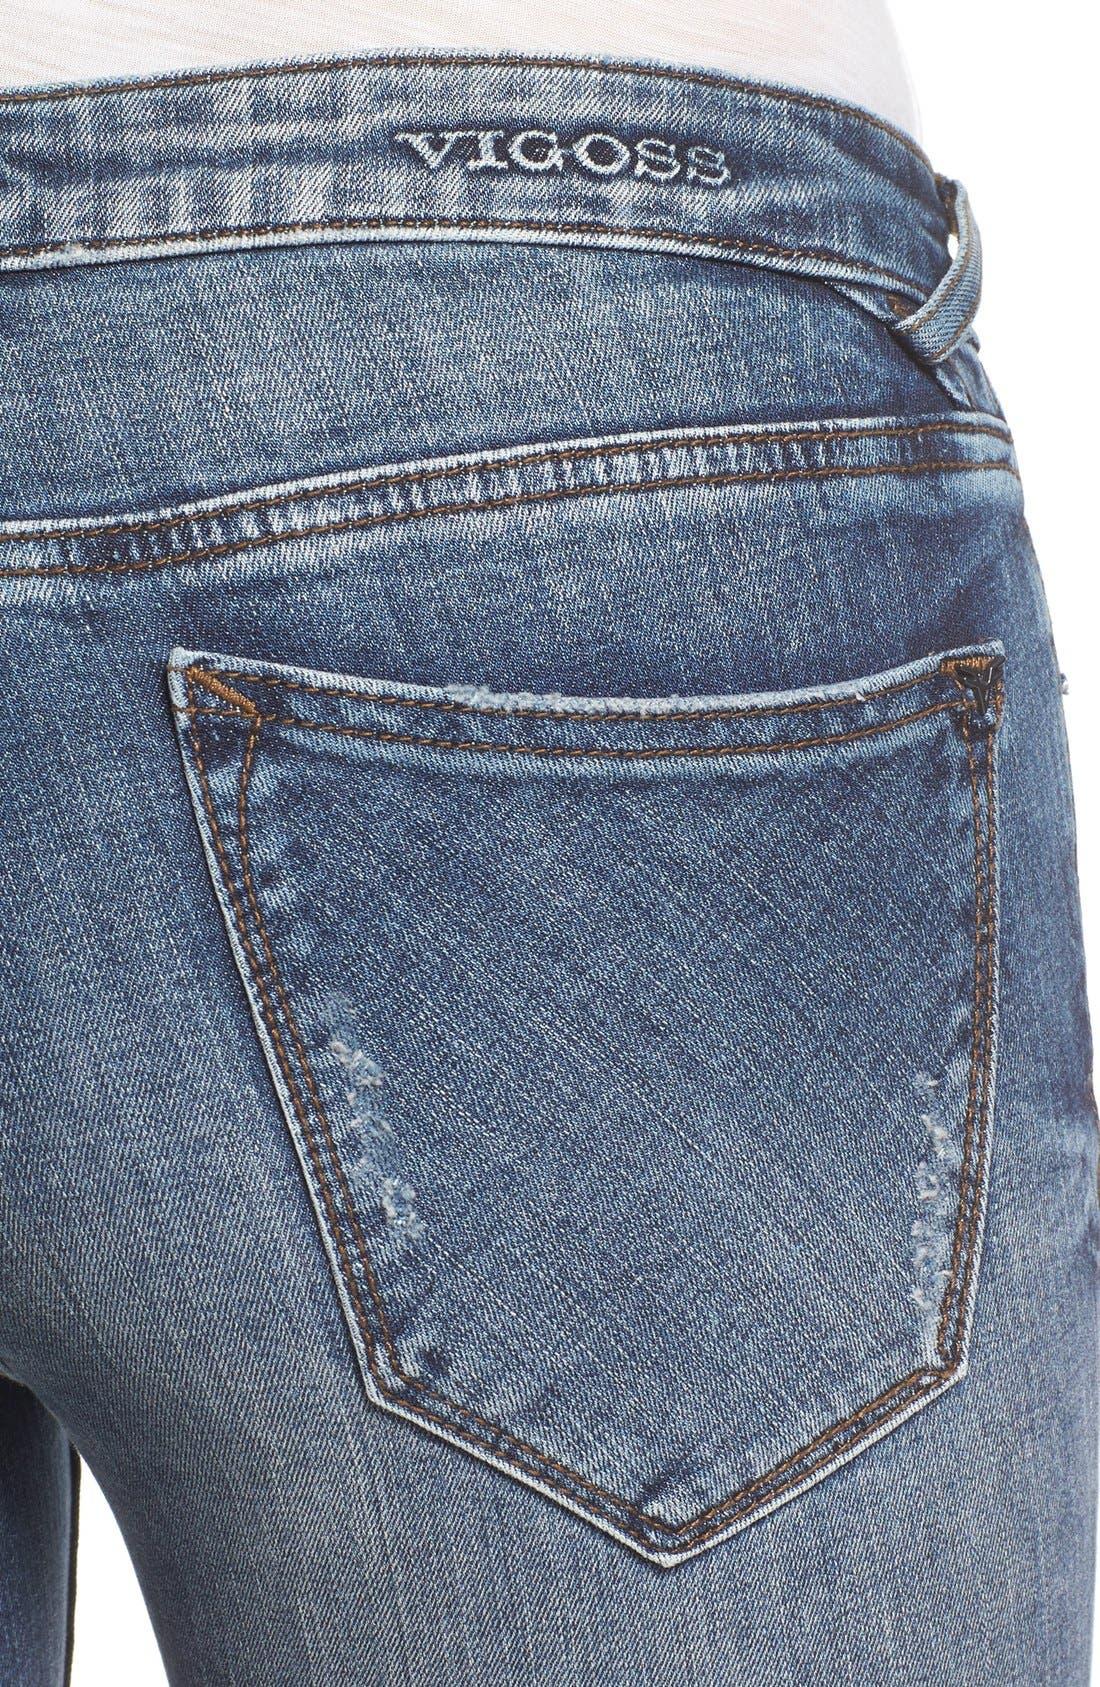 VIGOSS, 'Thompson Tomboy' Ripped Boyfriend Jeans, Alternate thumbnail 4, color, 400